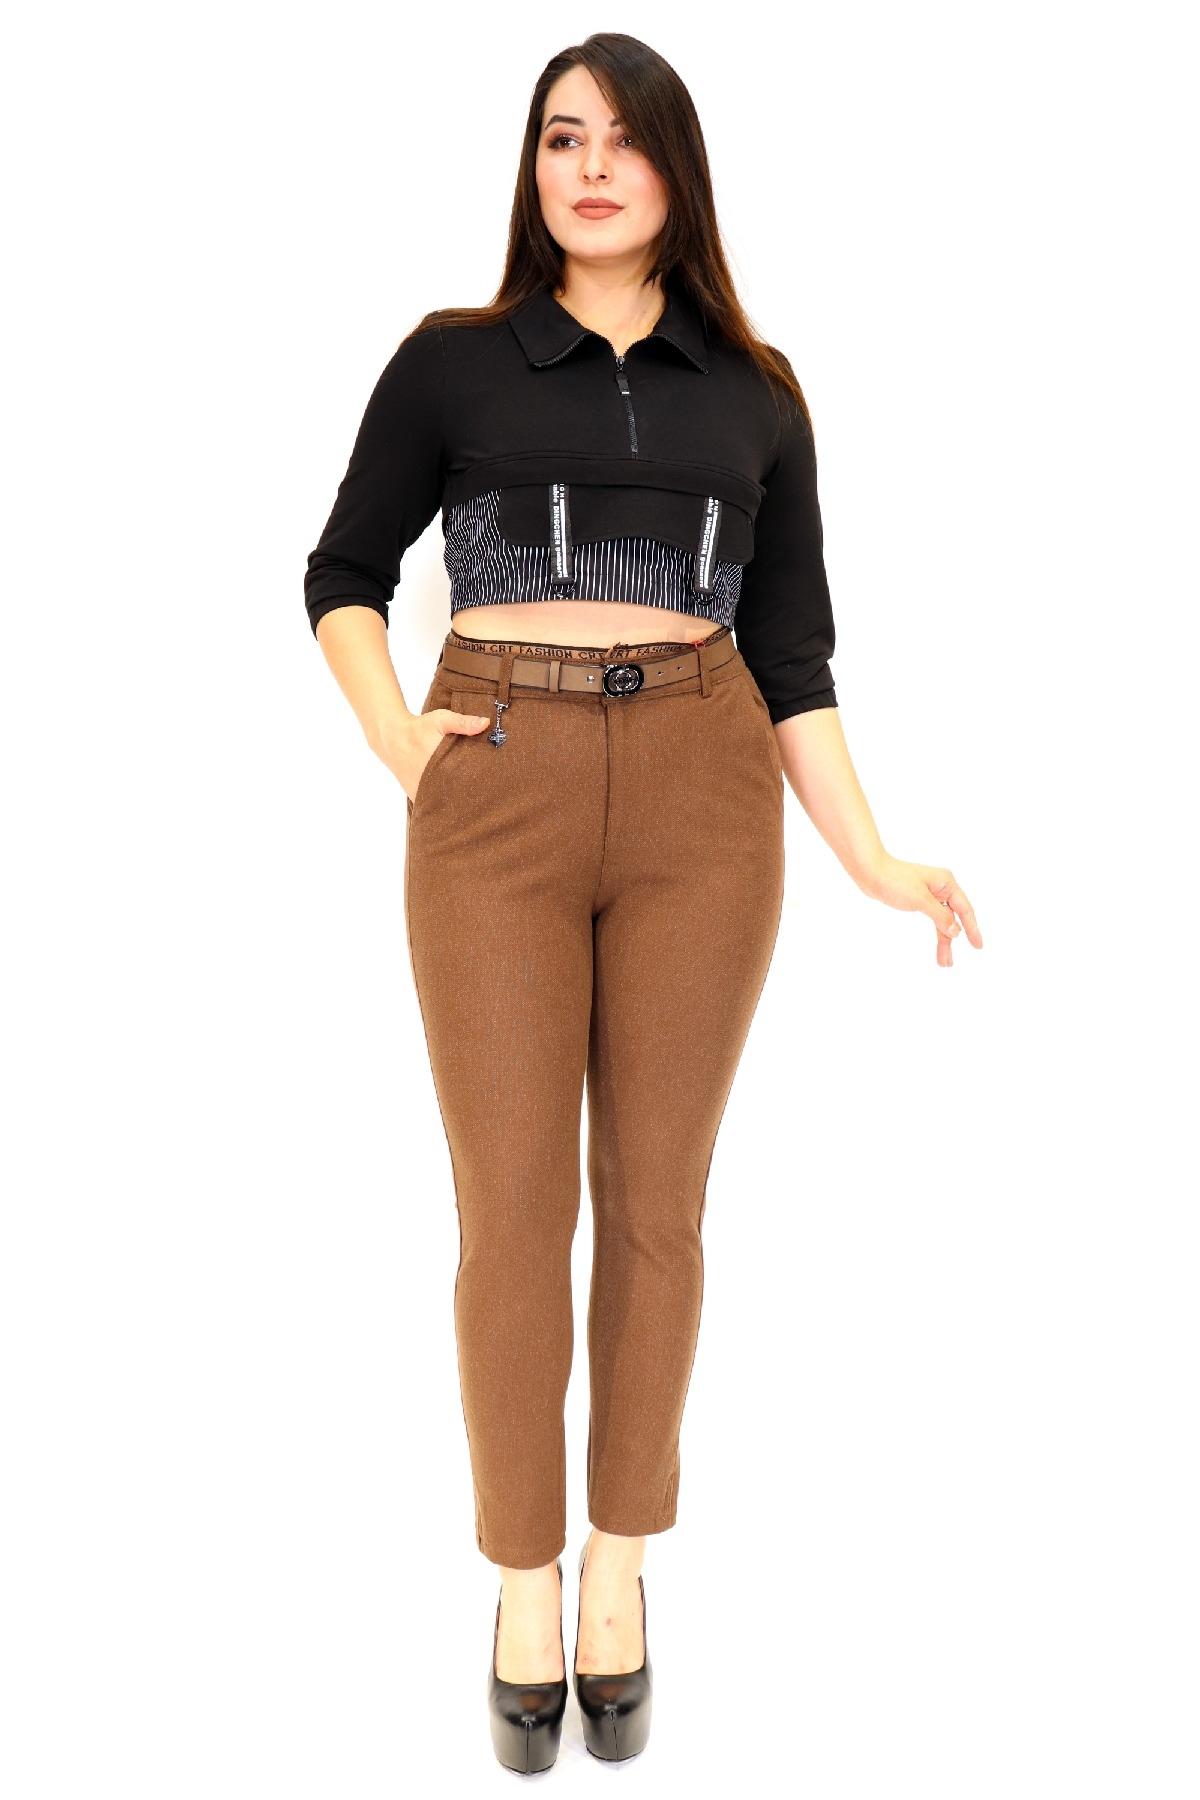 women pants-Camel